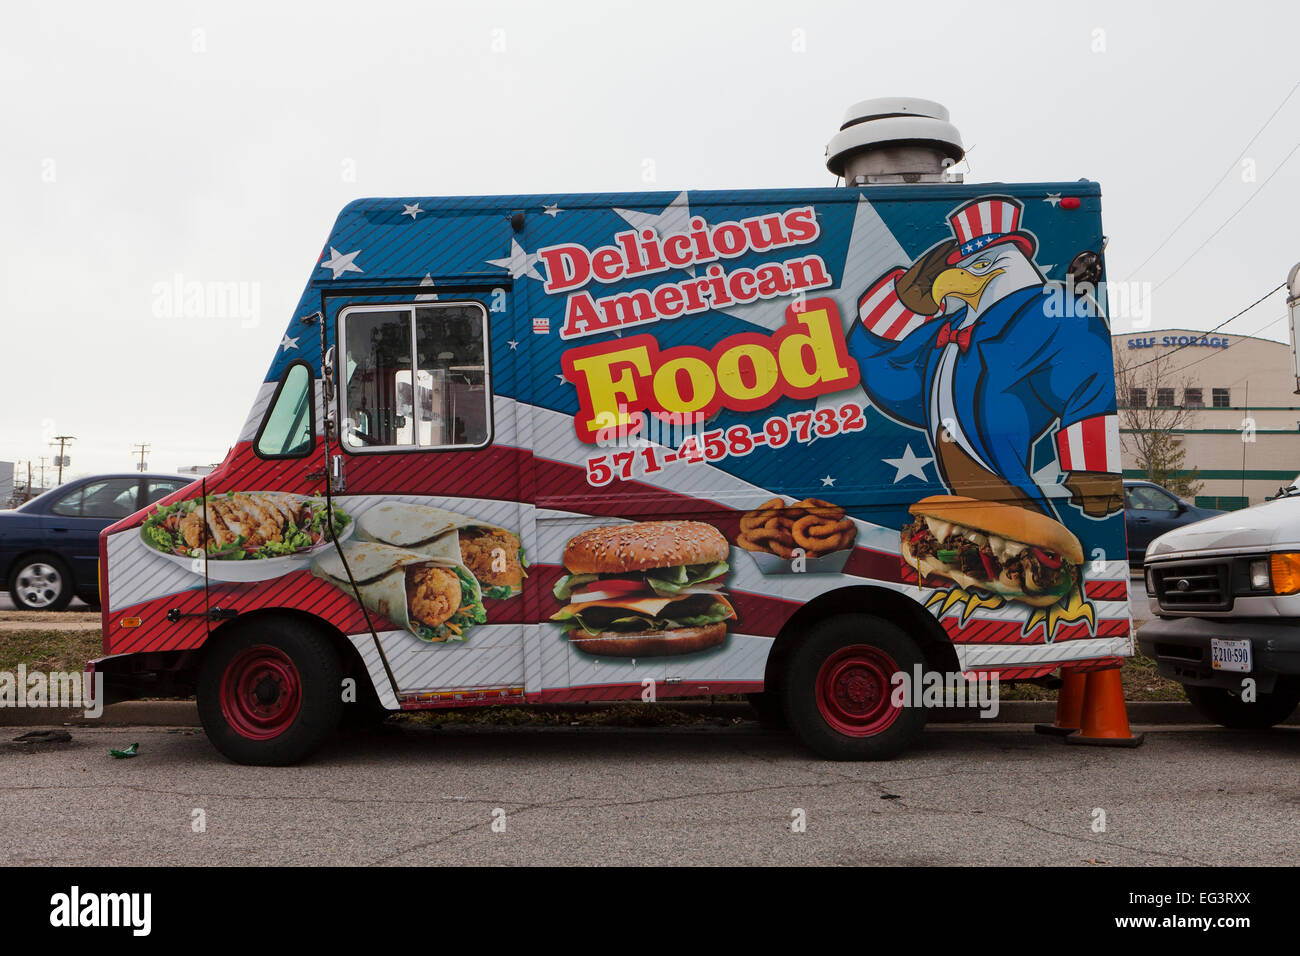 American food food truck - USA - Stock Image